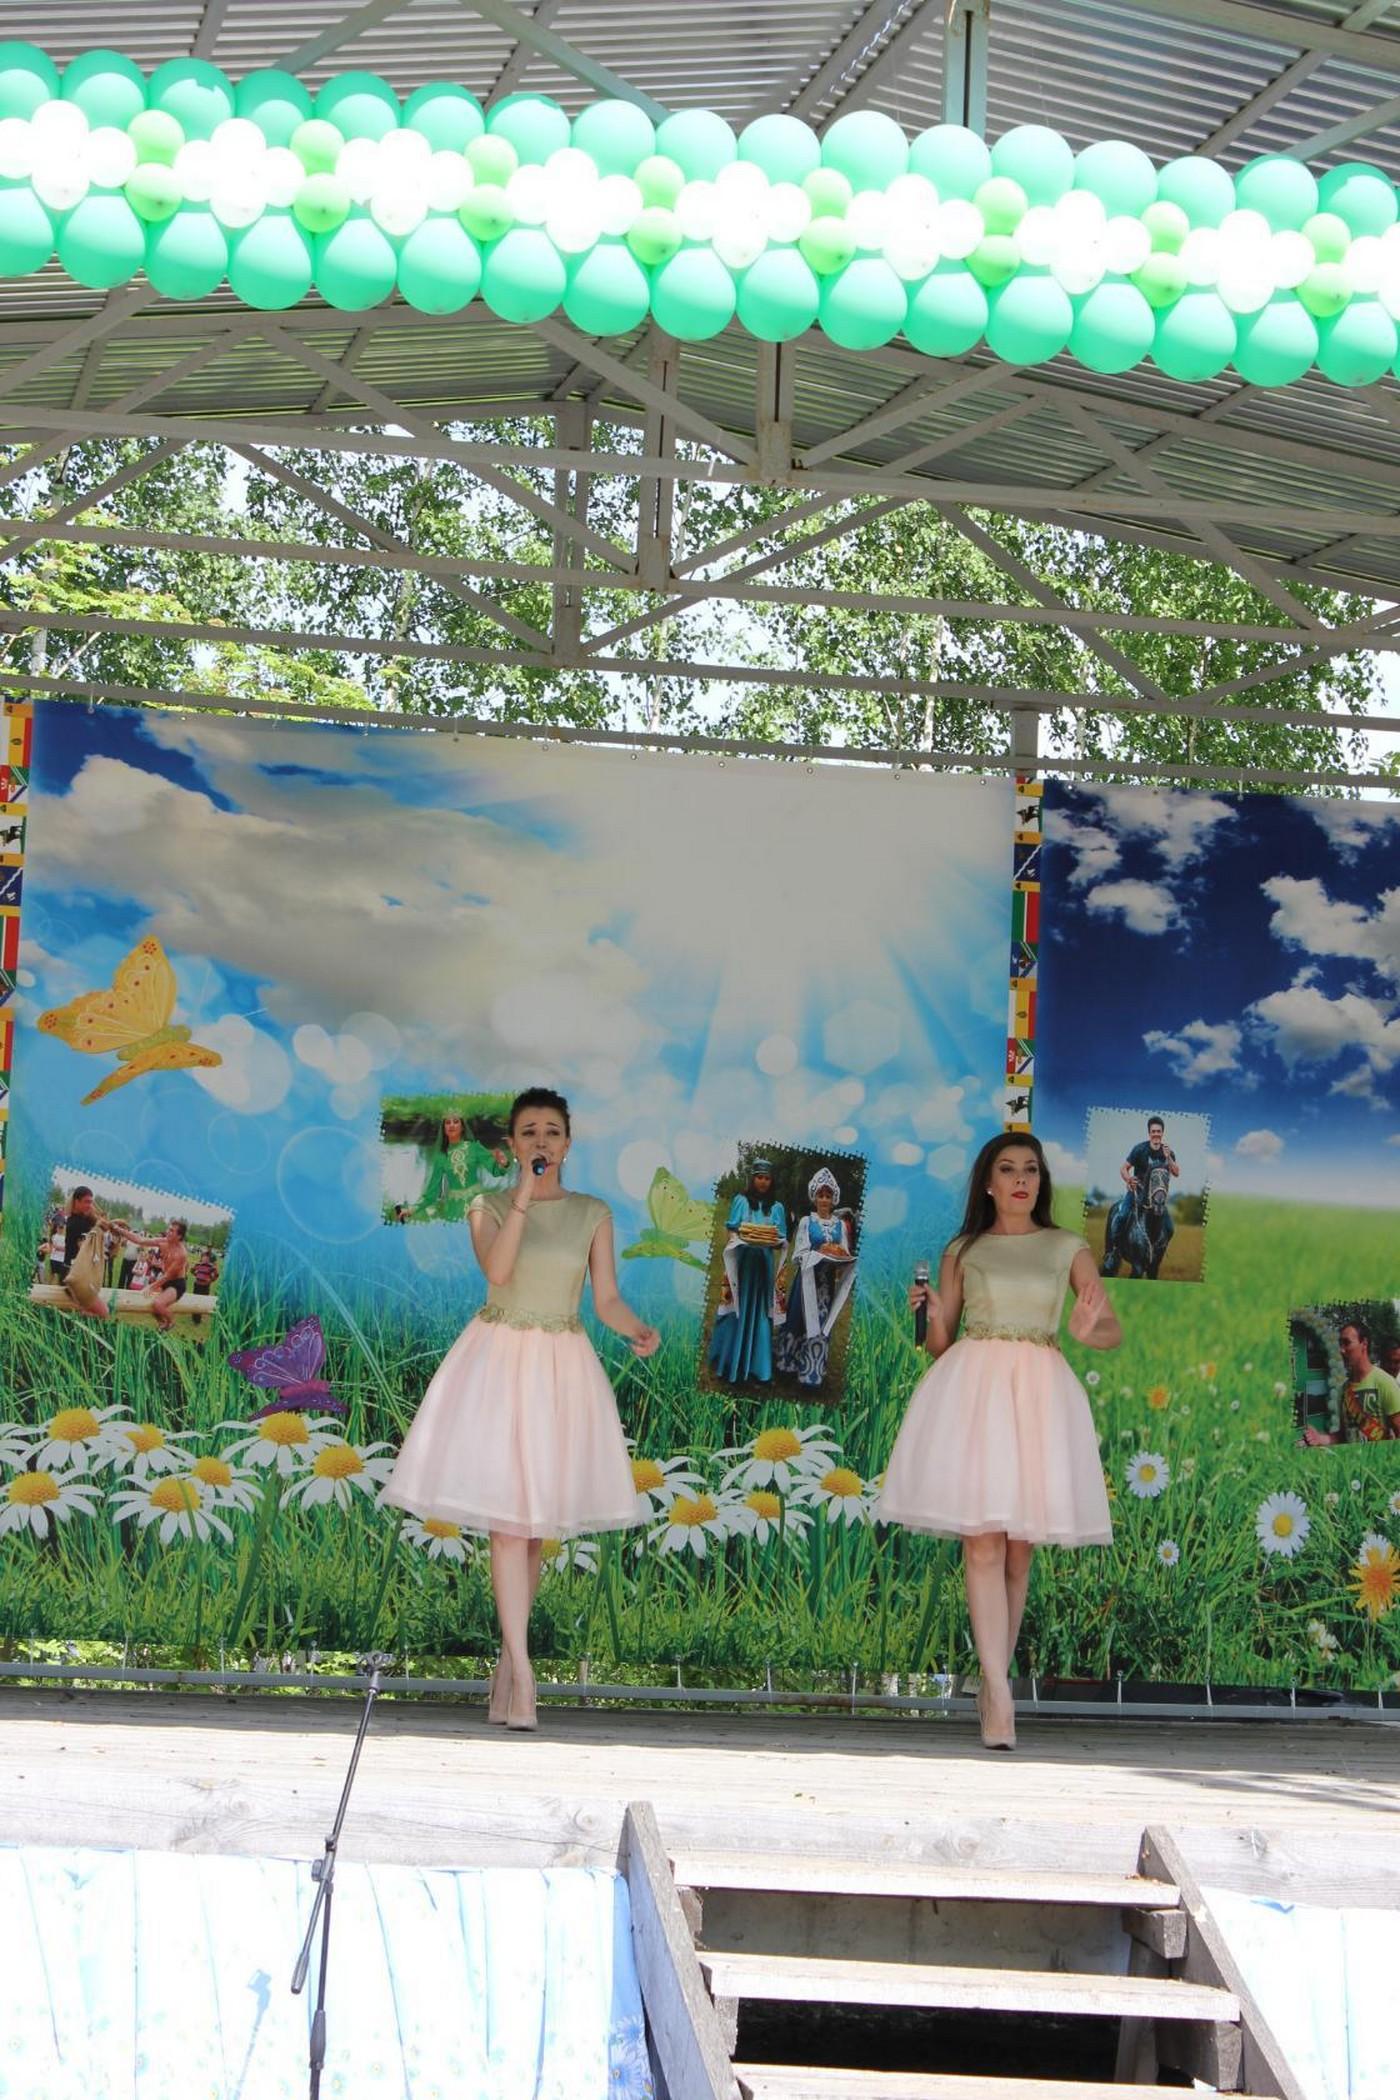 Sabantuy-2016-concert-276-Bastanovo